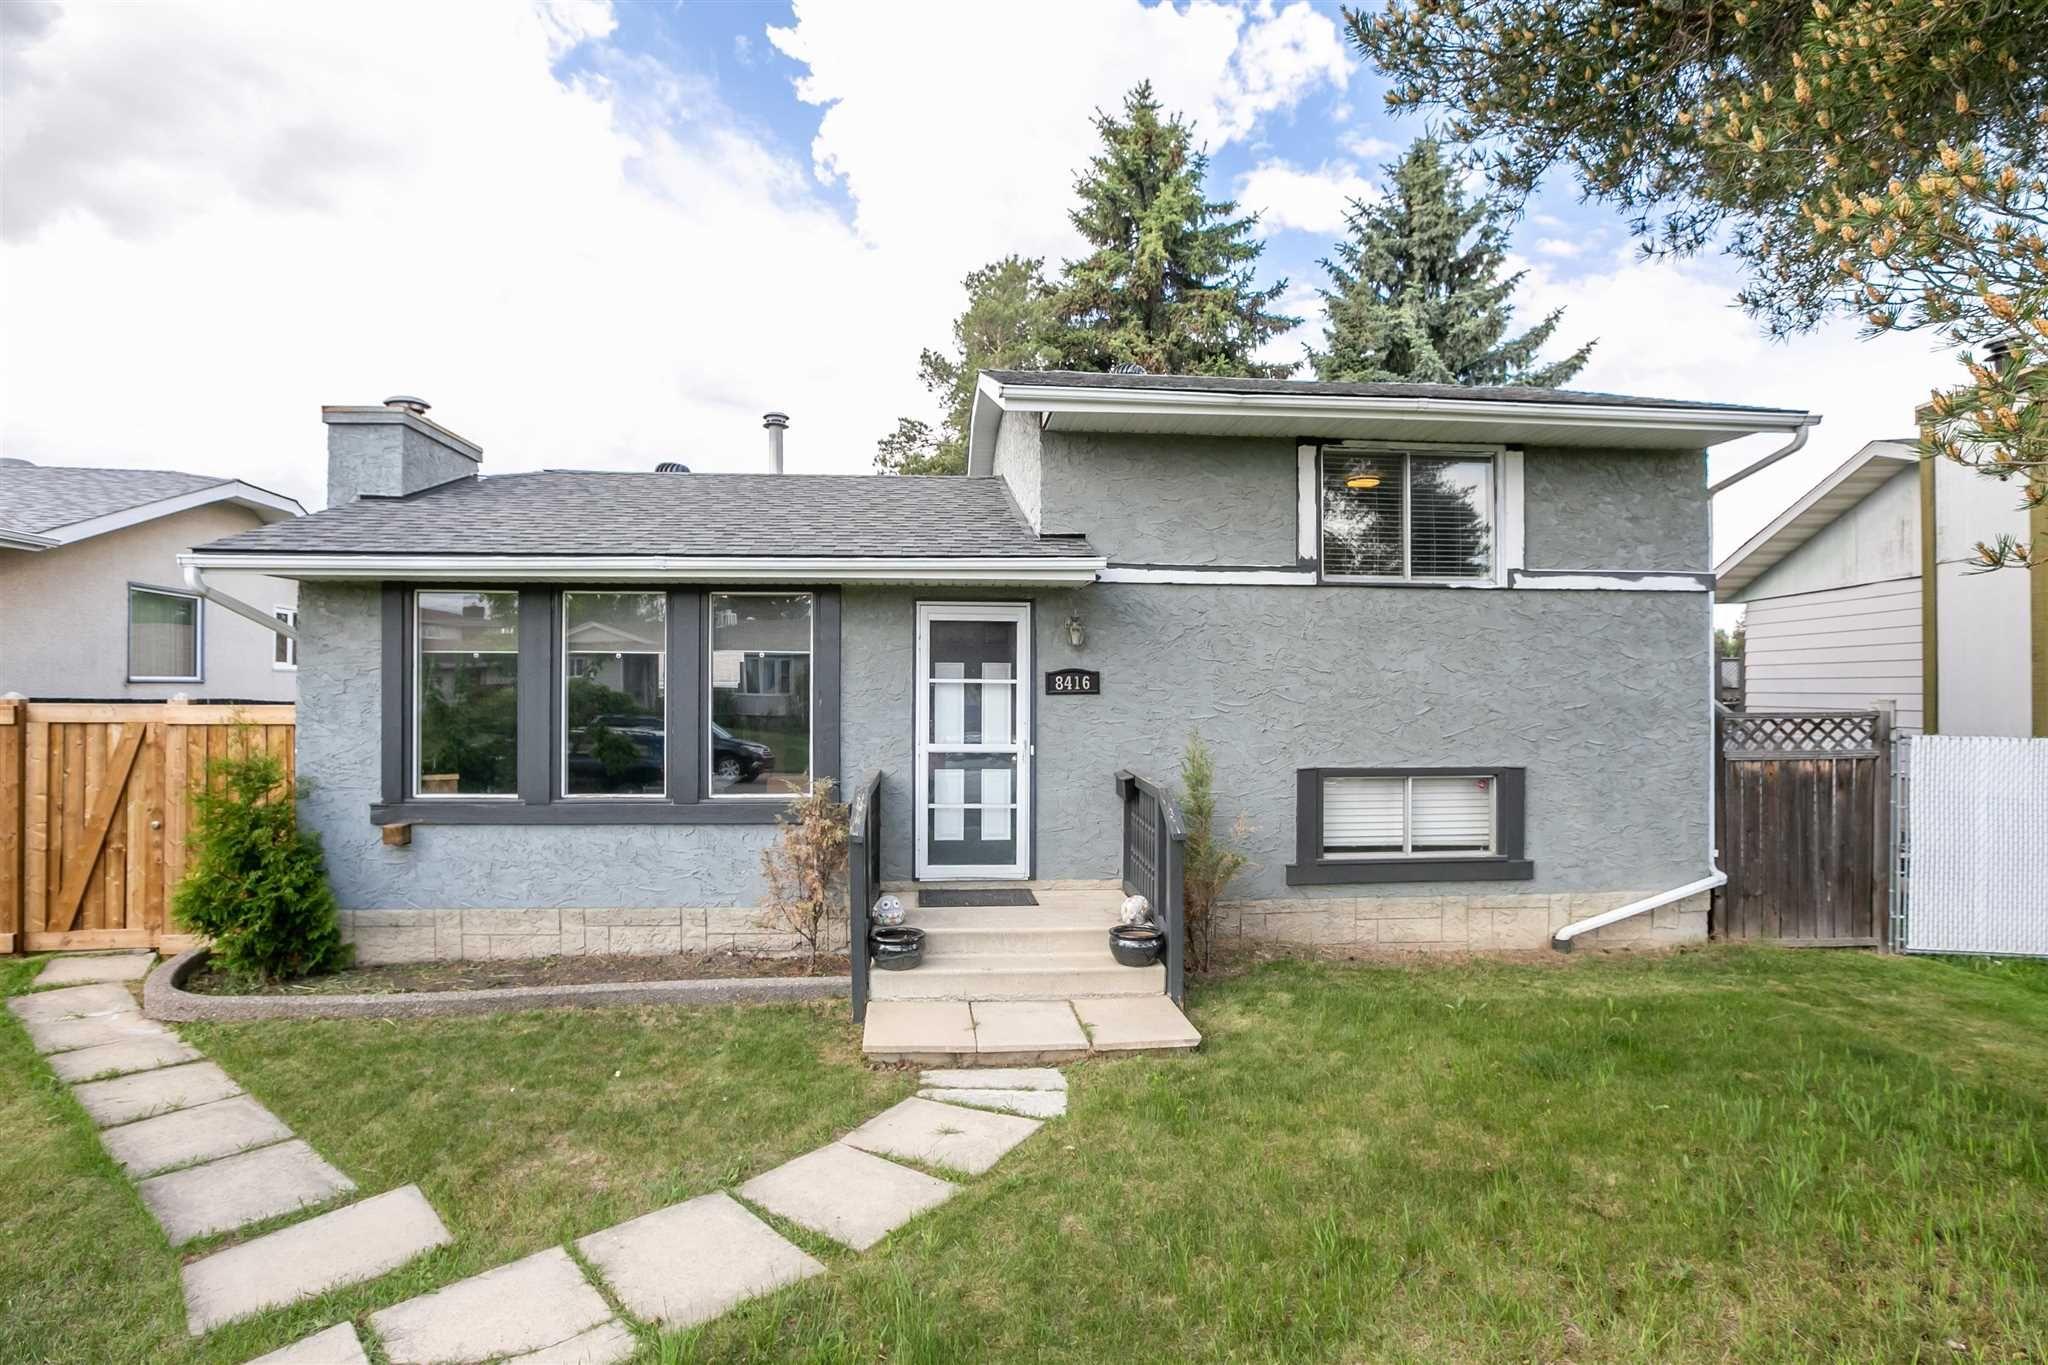 Main Photo: 8416 19 Avenue in Edmonton: Zone 29 House for sale : MLS®# E4248440